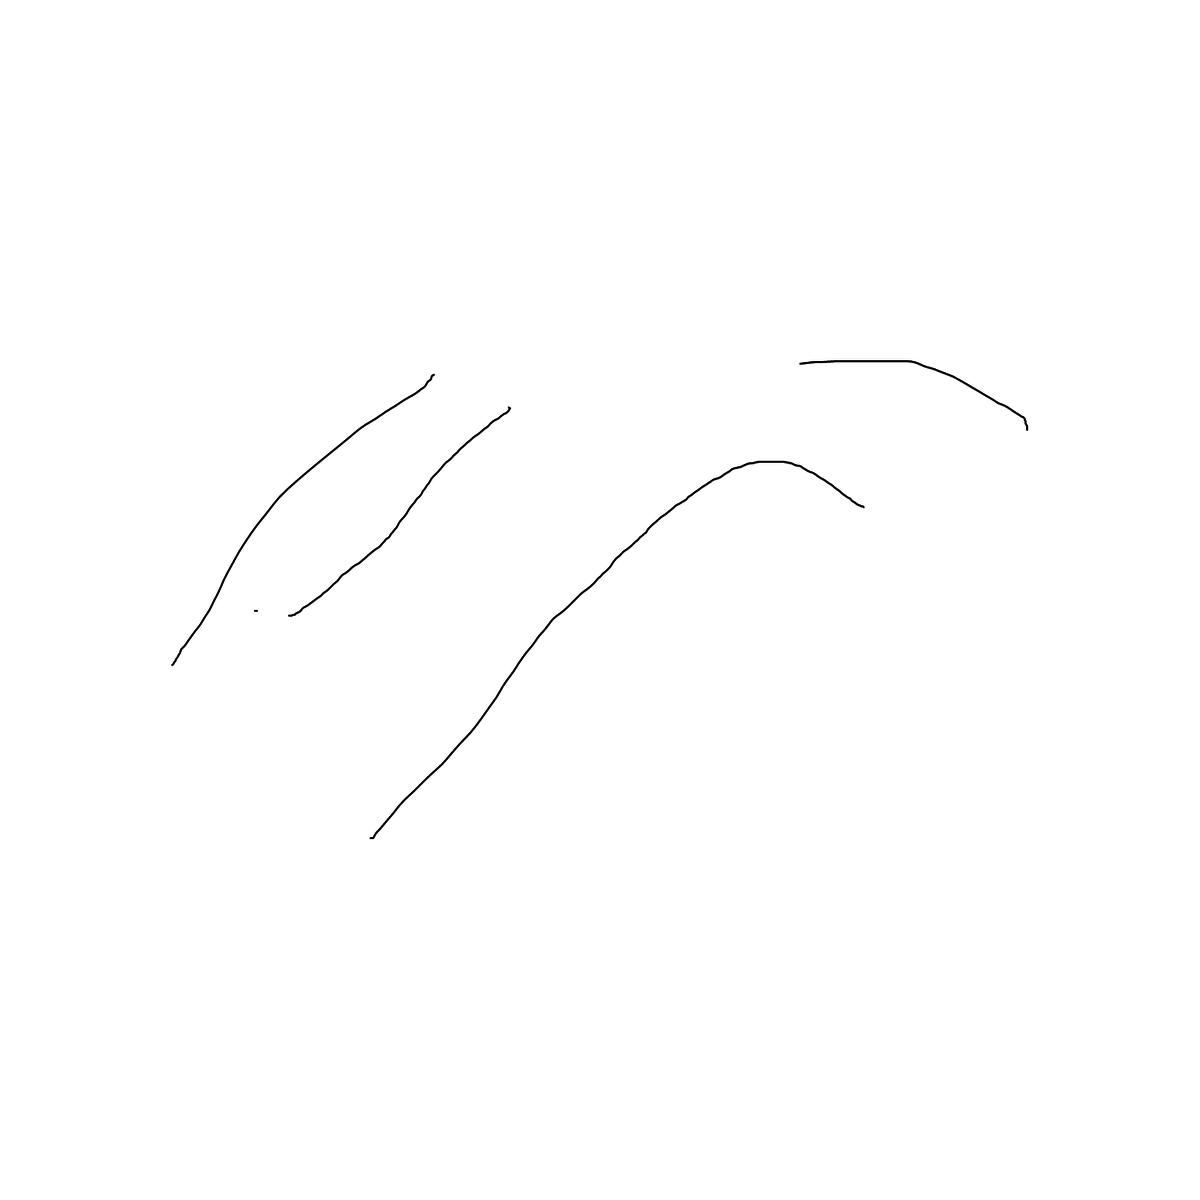 BAAAM drawing#399 lat:52.0689811706543000lng: 4.3254370689392090